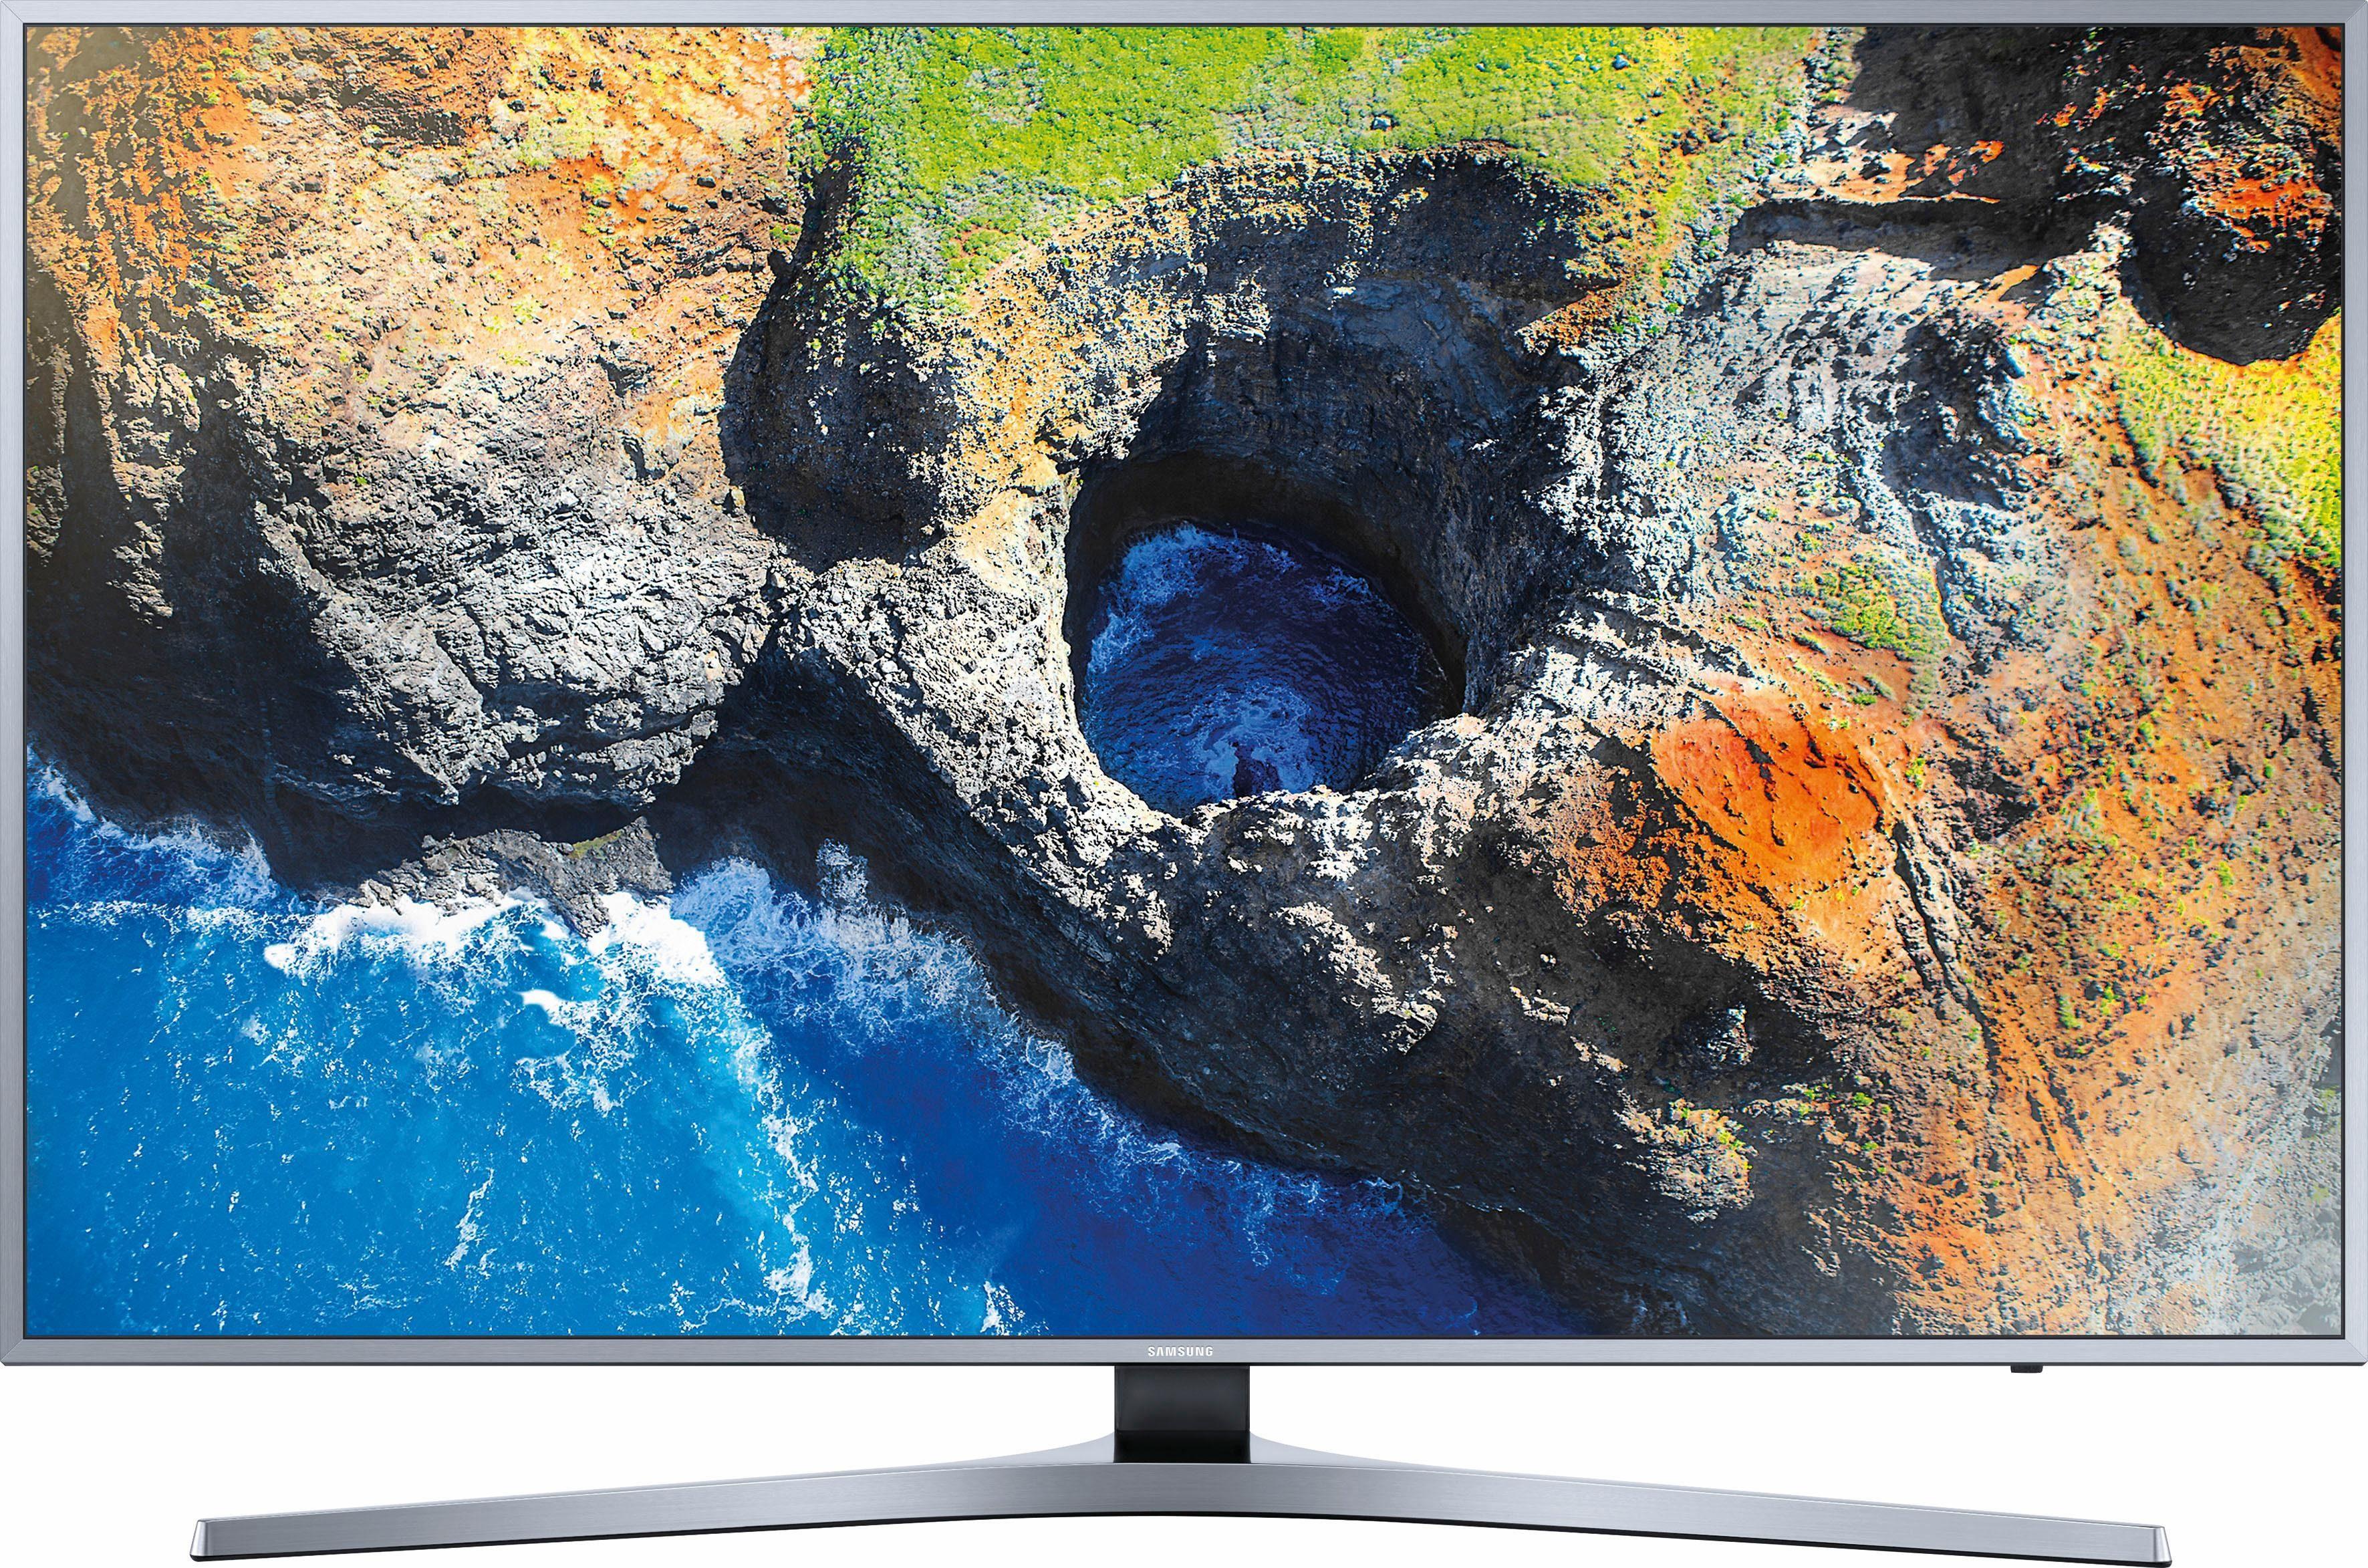 Samsung UE65MU6409UXZG LED-Fernseher (163 cm/65 Zoll, 4K Ultra HD, Smart-TV, 360° Video Player)